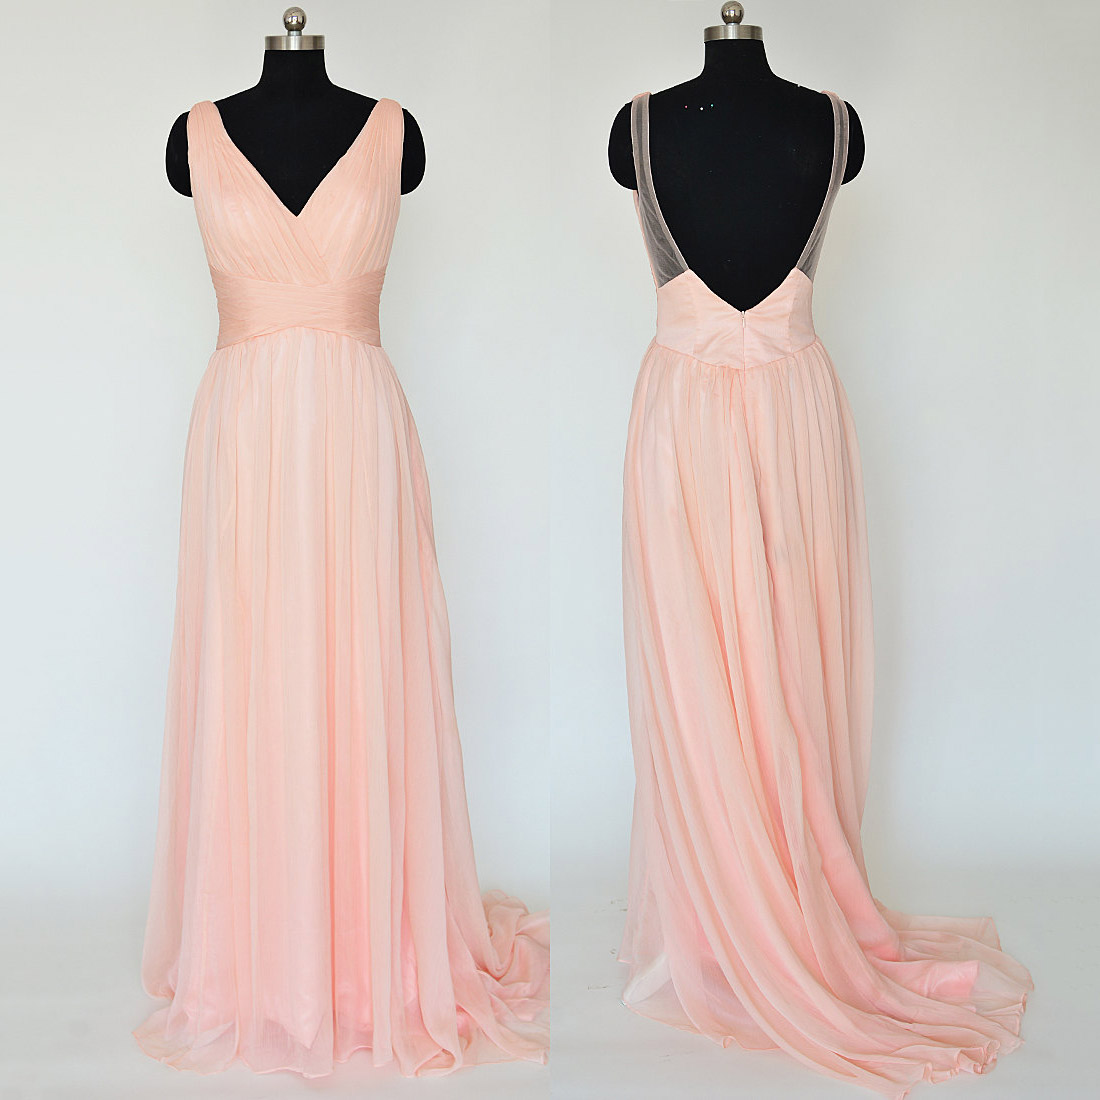 Pink long chiffon bridesmaid dresses v neck bridesmaid gowns pink long chiffon bridesmaid dresses v neck bridesmaid gowns sexy backless bridesmaid dresses ombrellifo Images